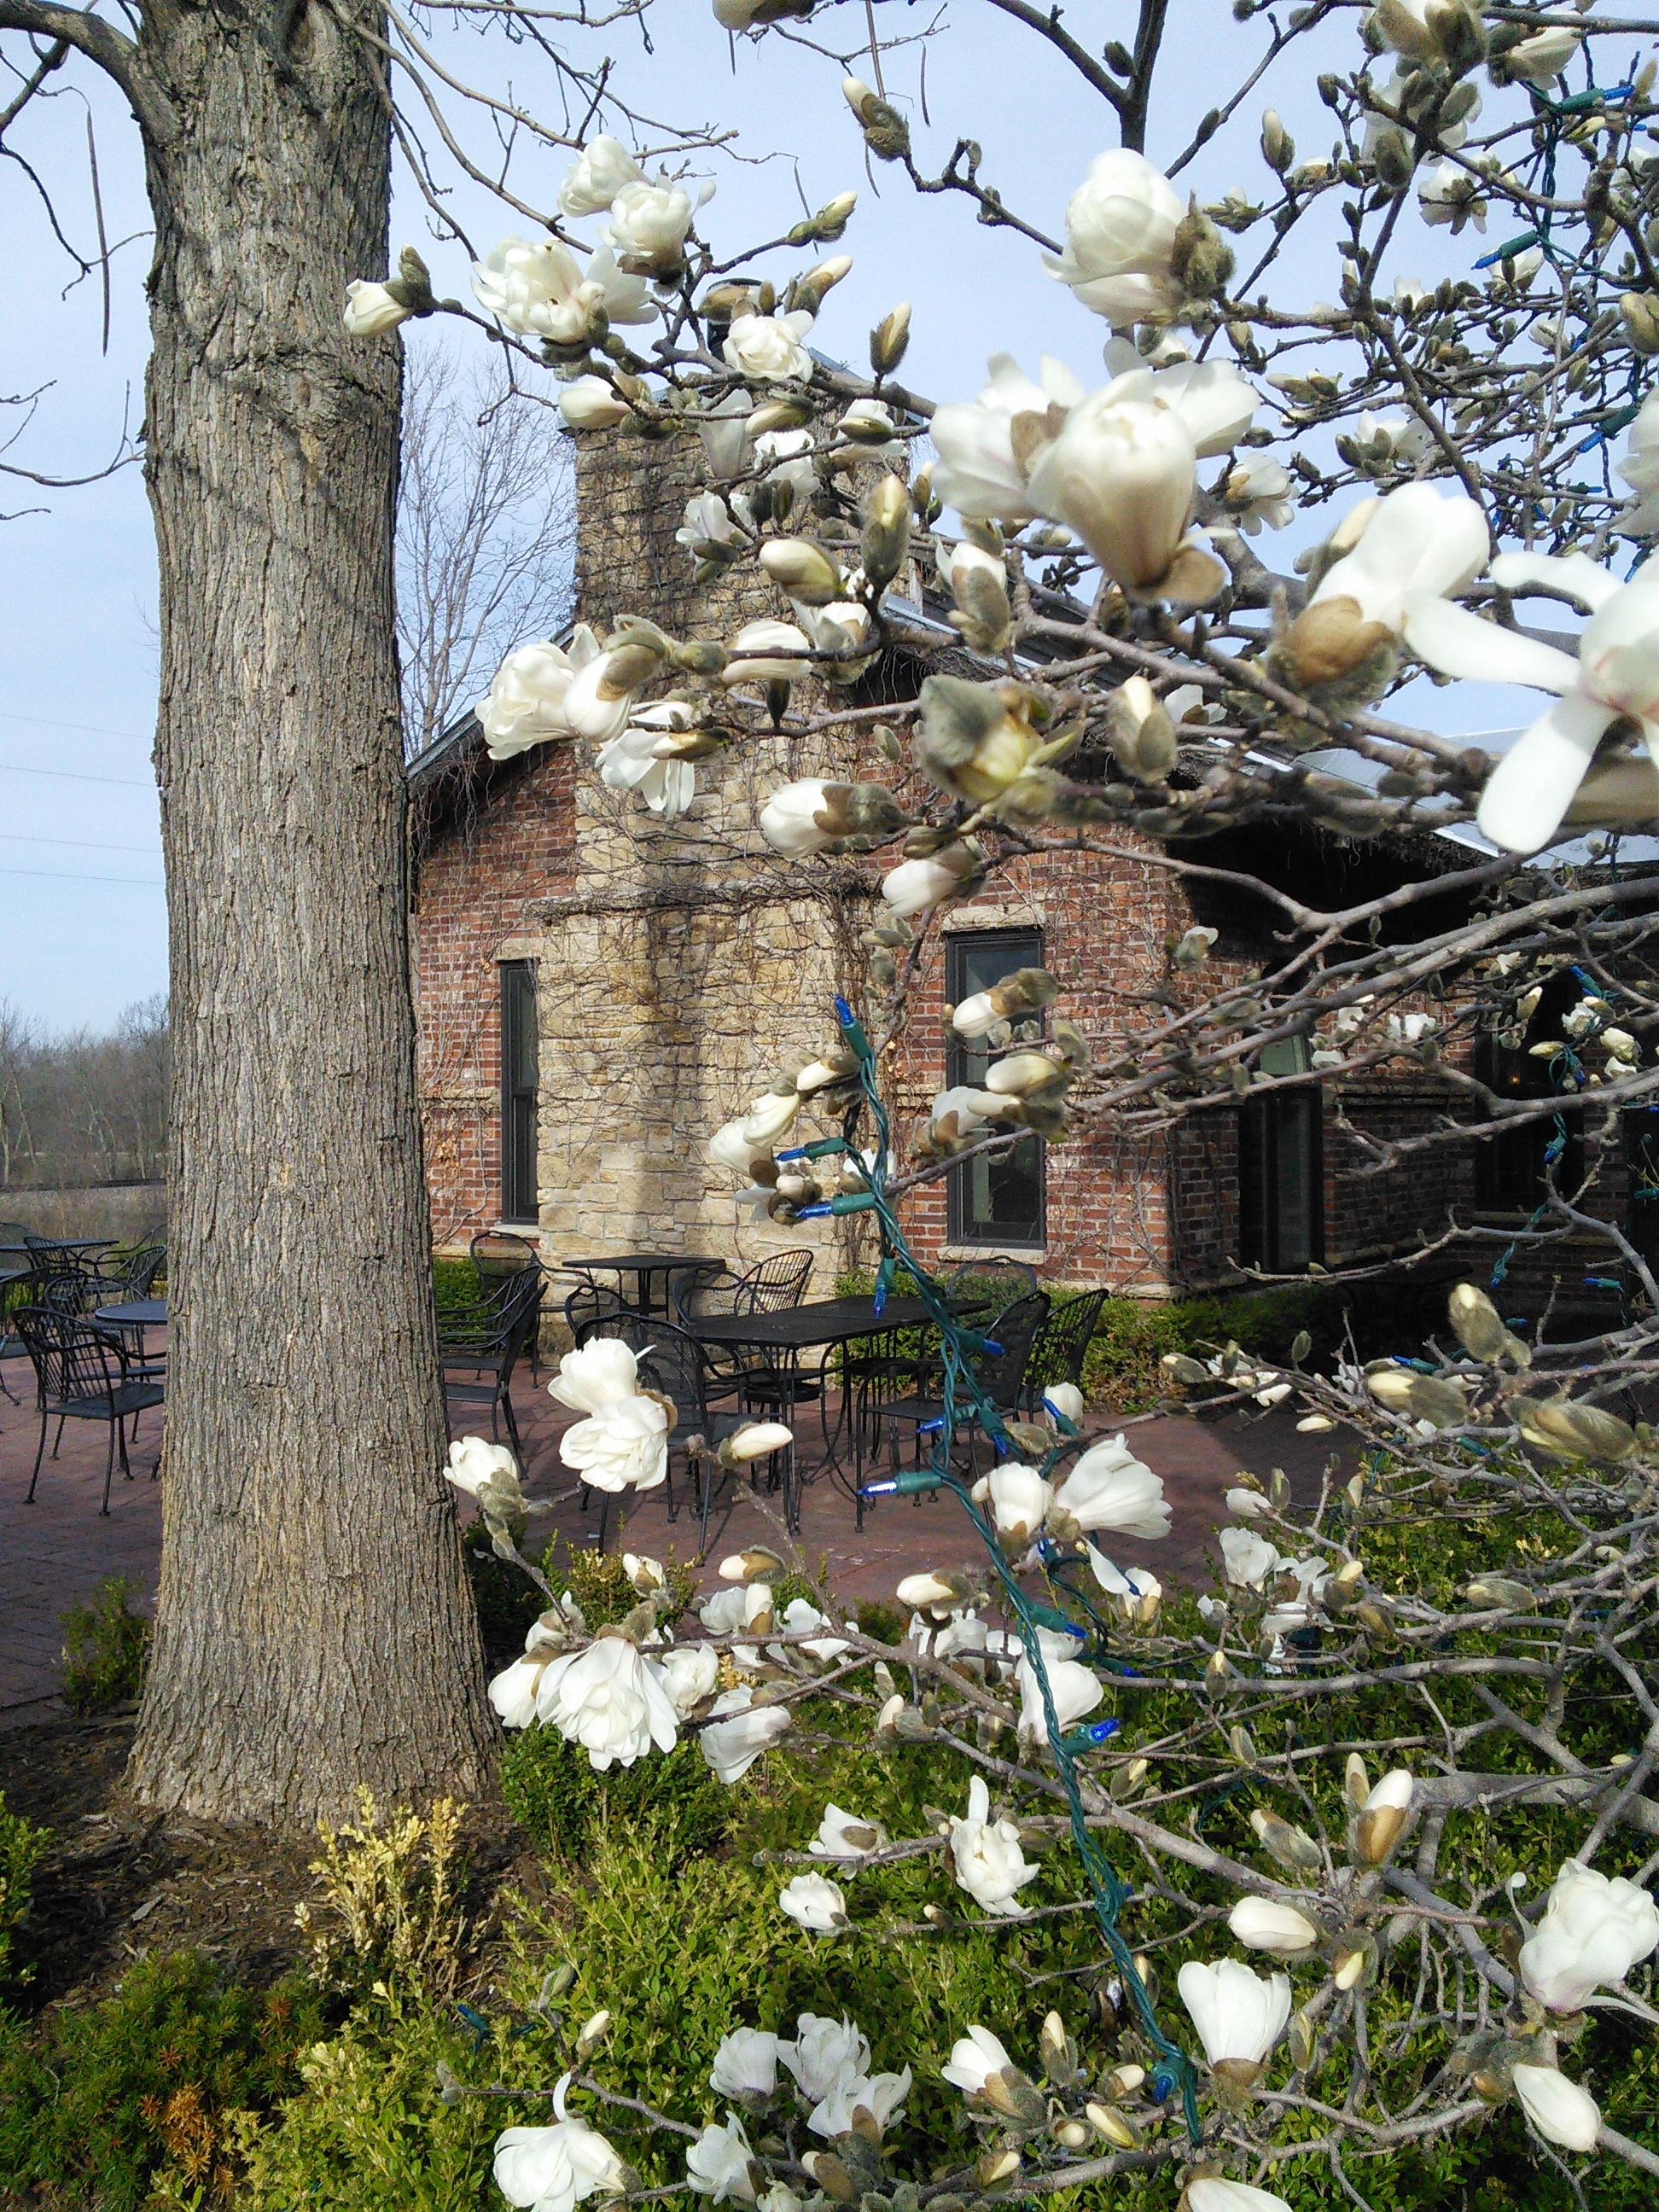 4-15-15 spring time magnolia